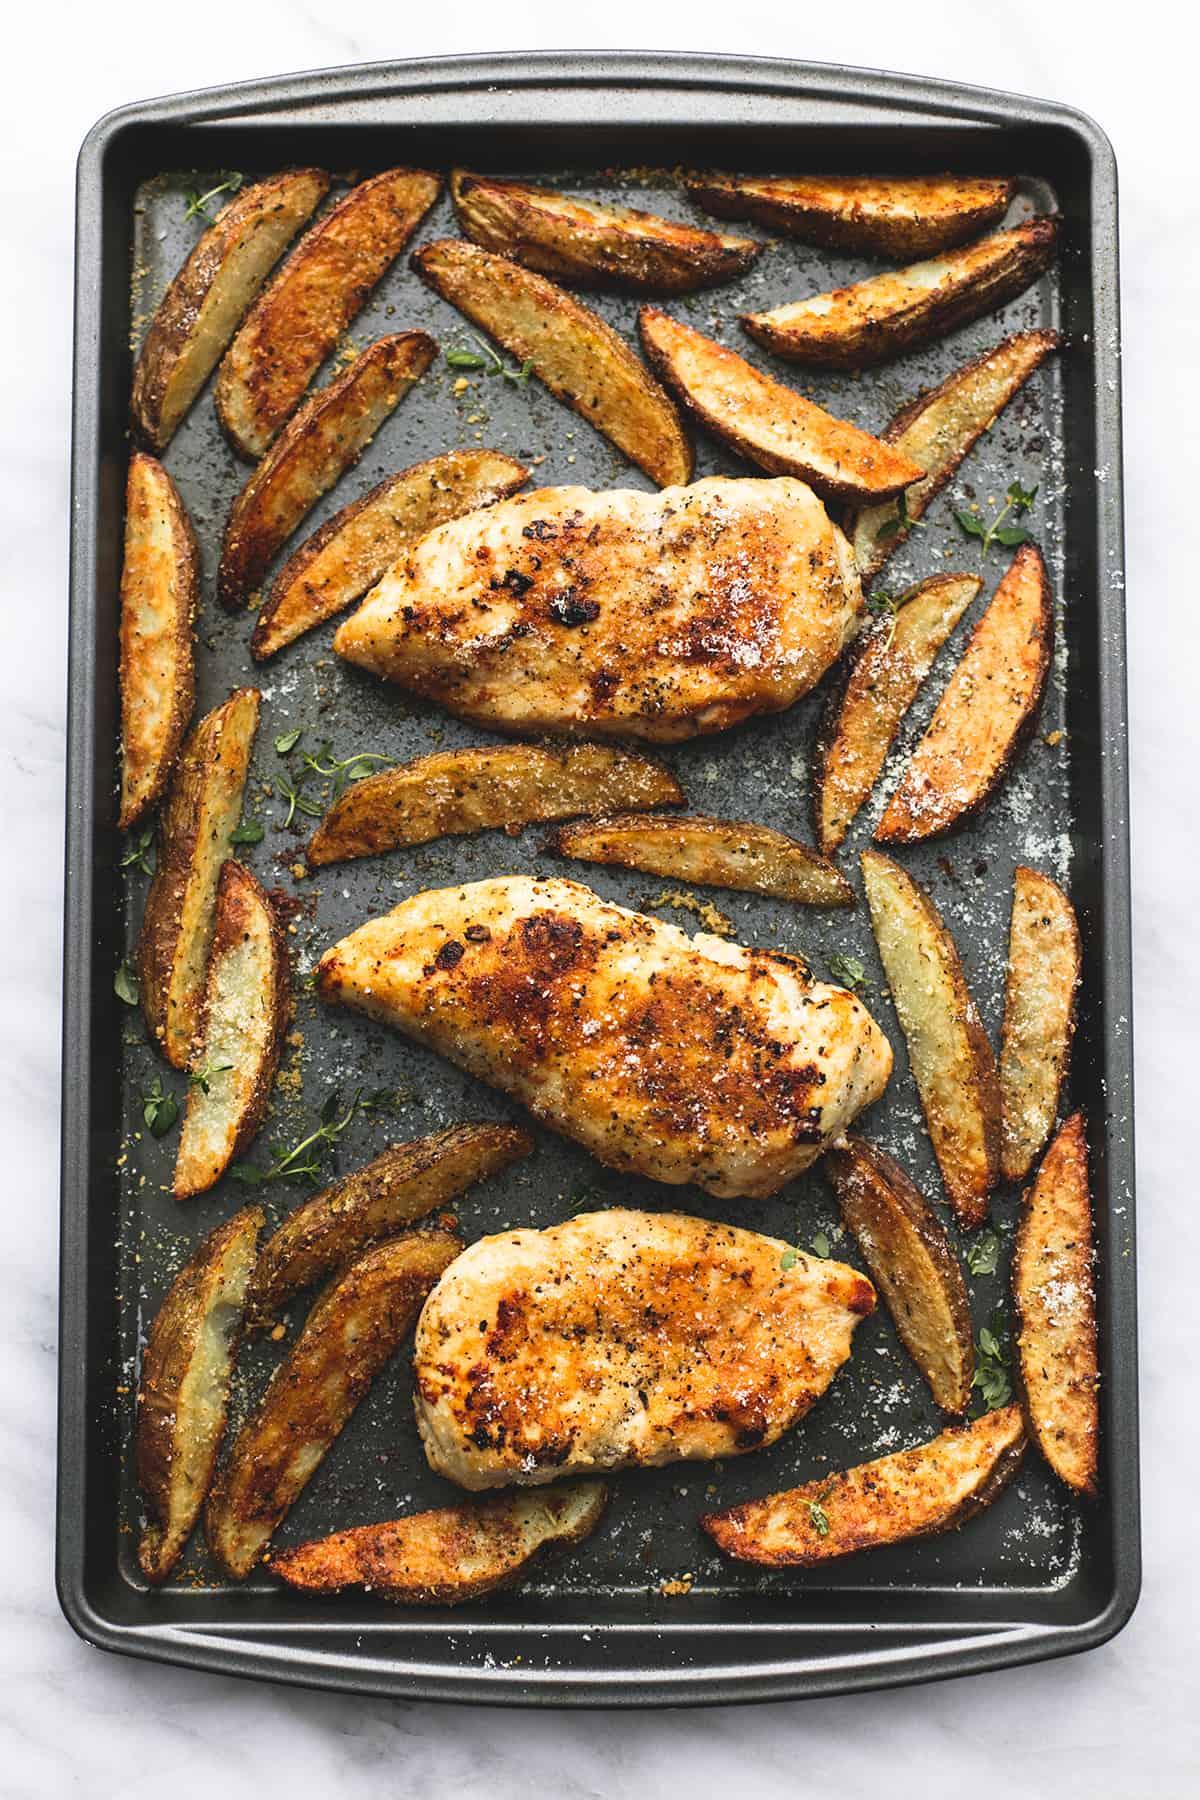 Sheet Pan Garlic Parmesan Chicken & Potatoes | lecremedelacrumb.com